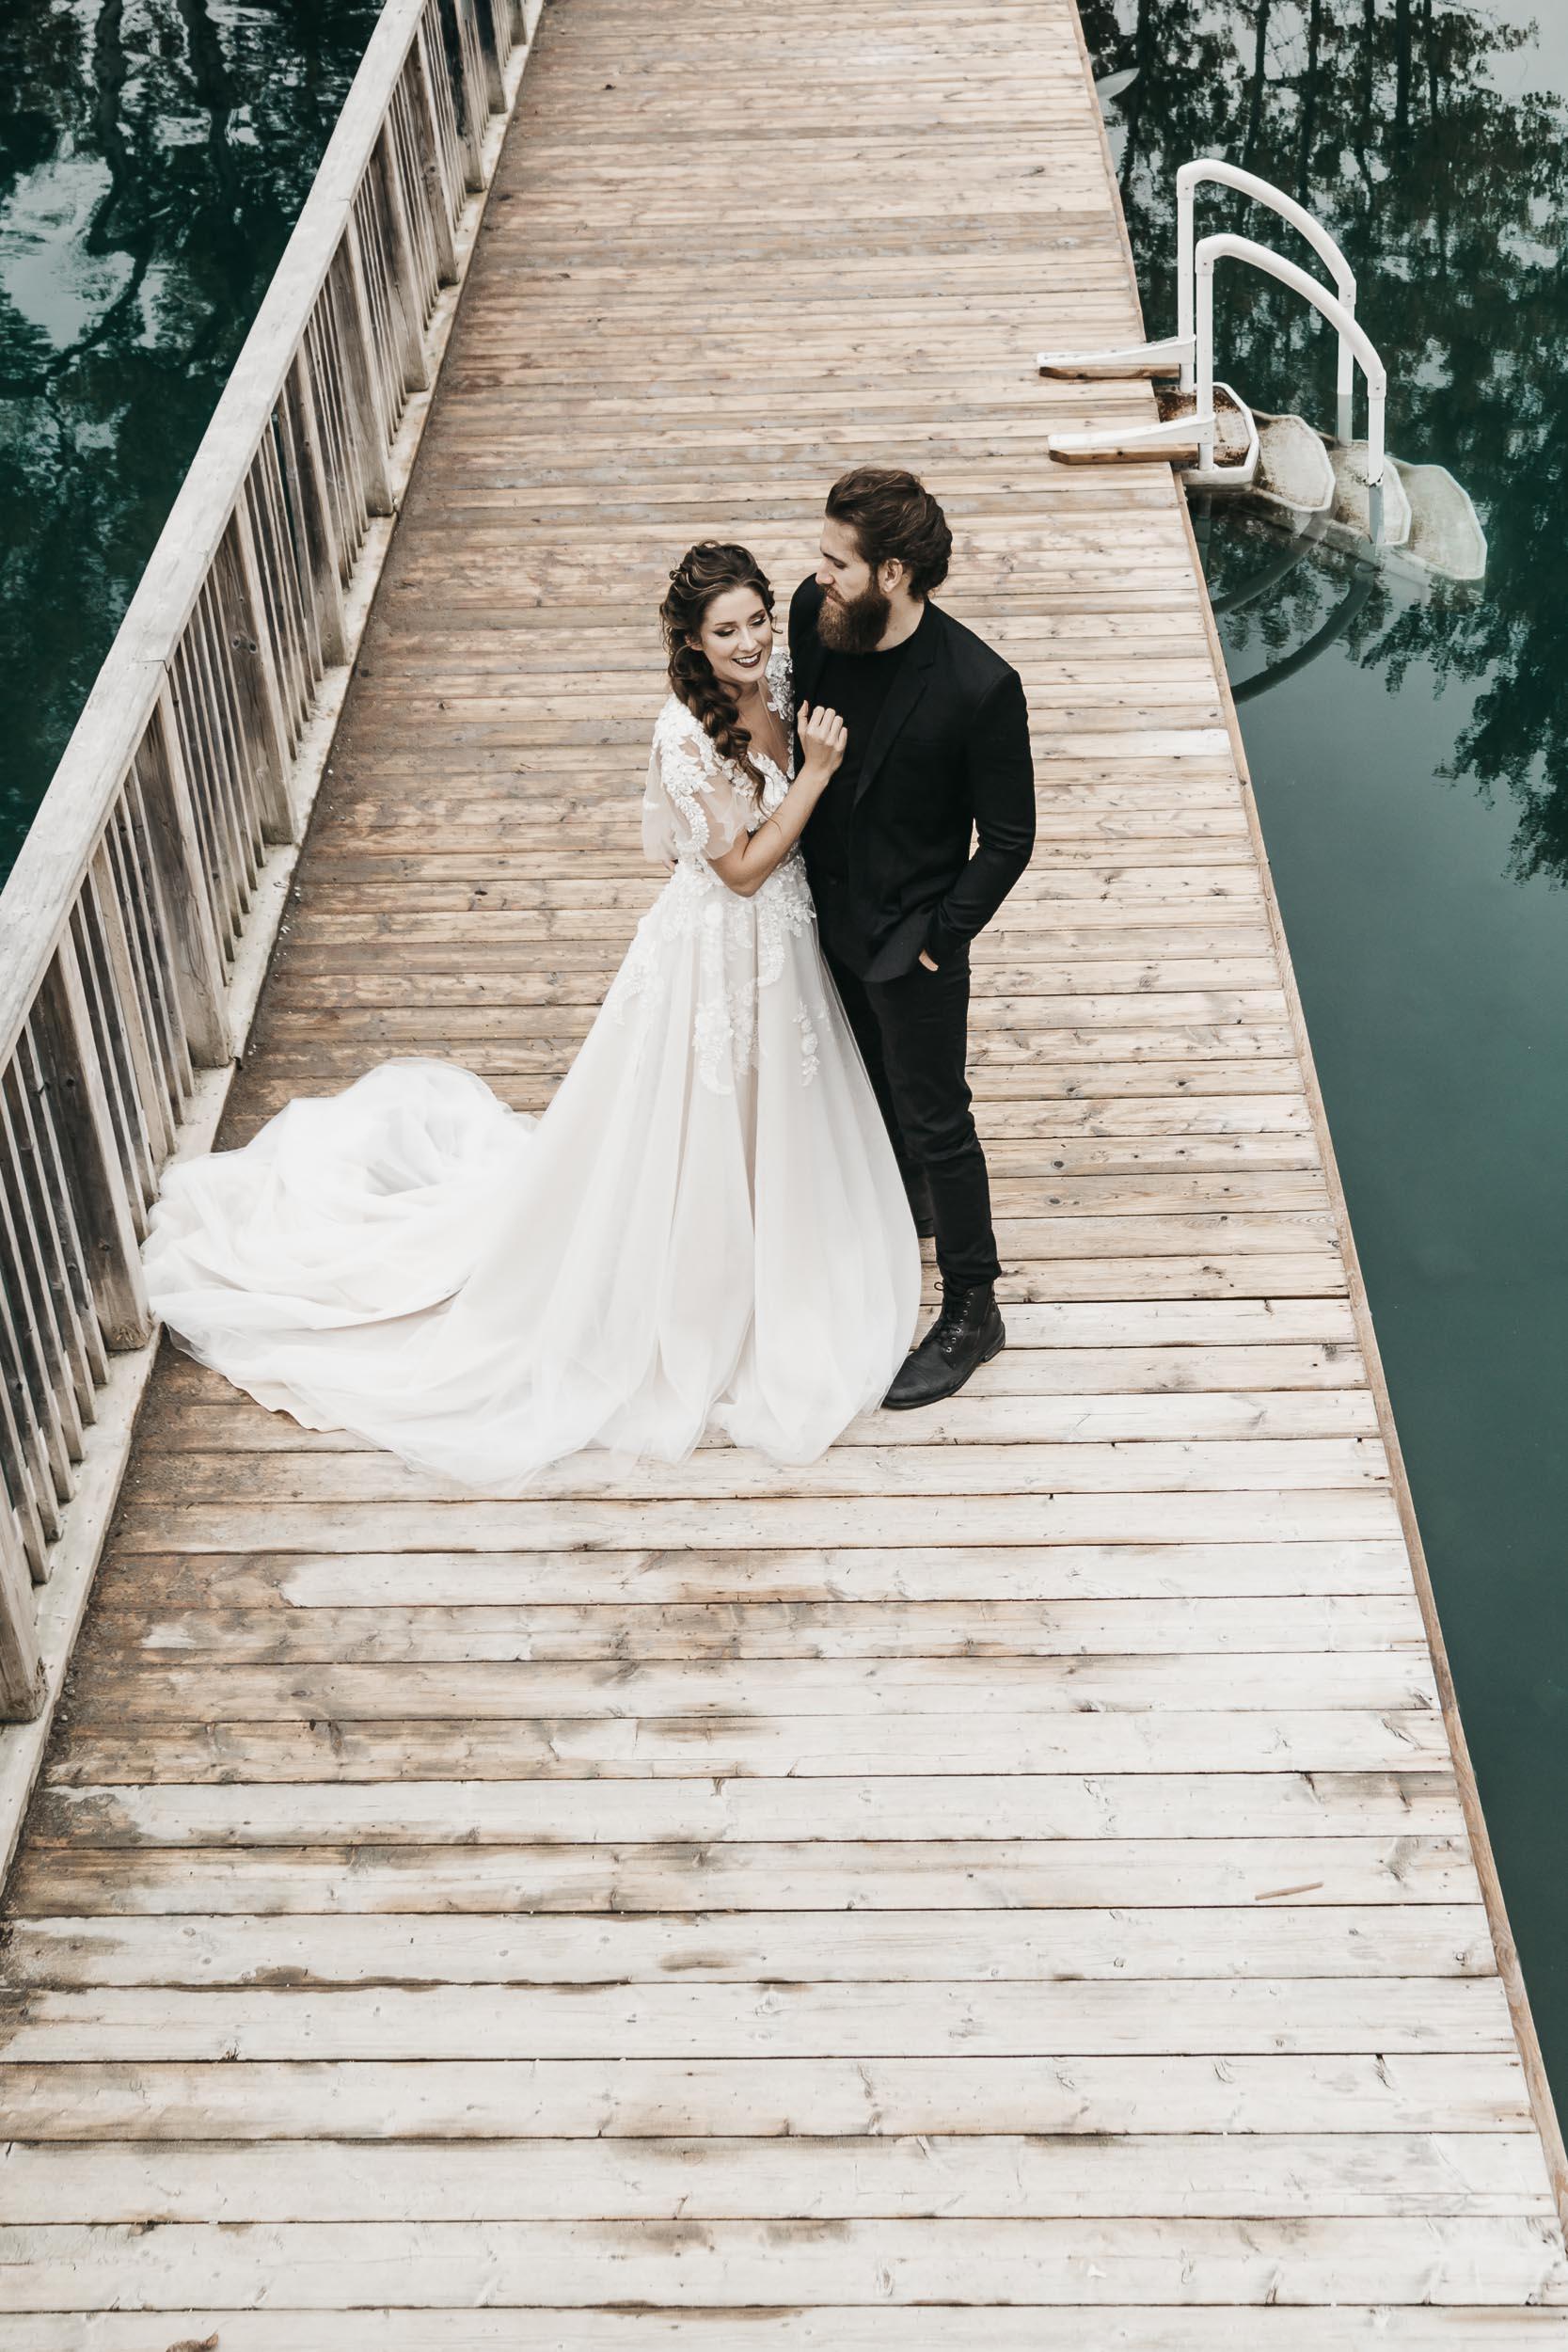 intimate-wedding-elopement-photographer-ottawa-toronto-0002.jpg